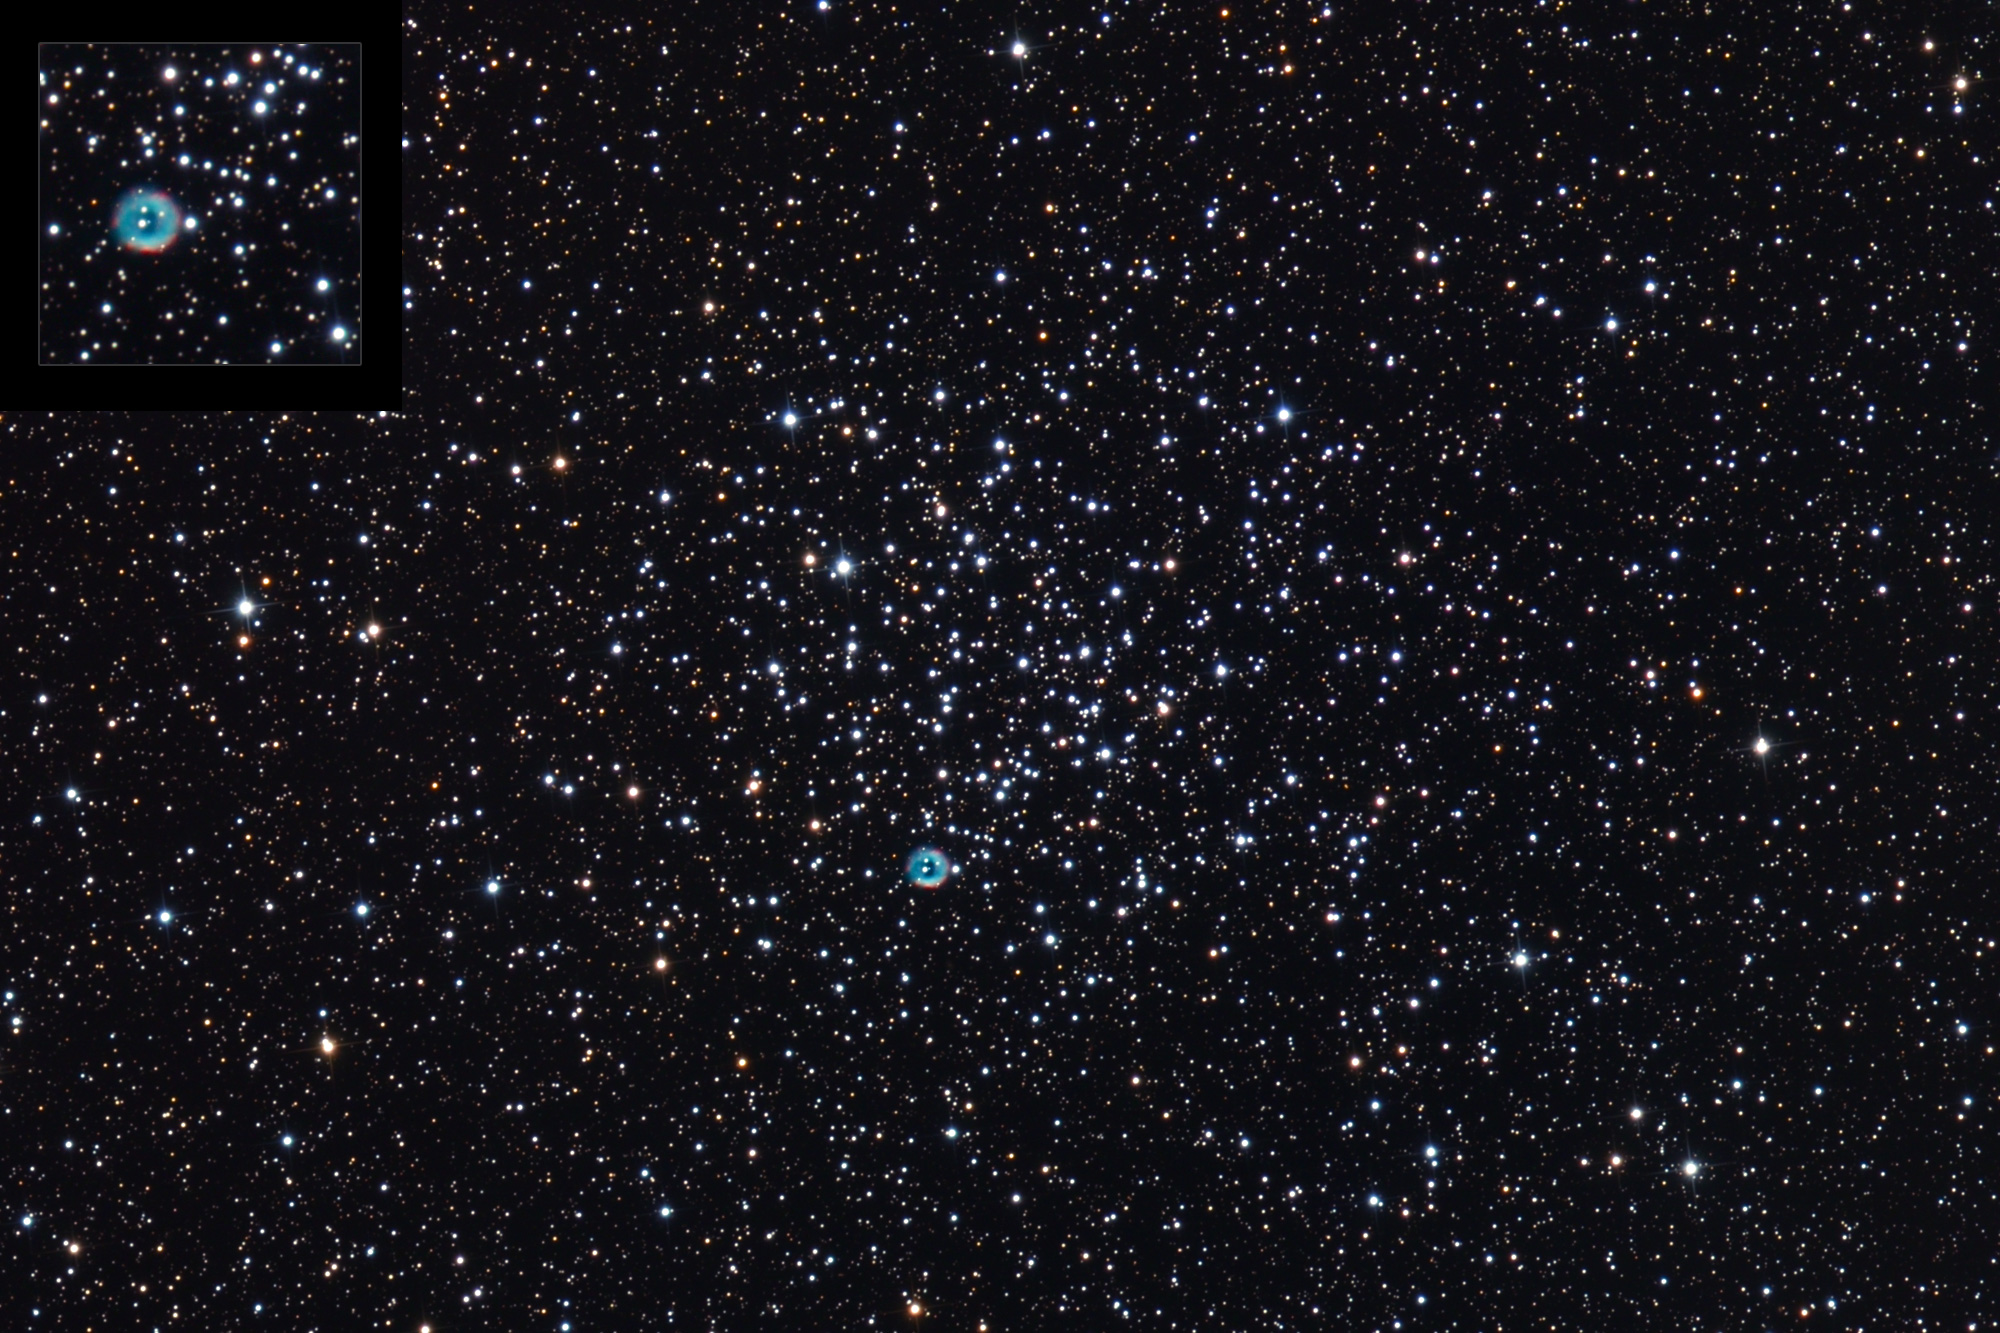 Estrellas jvenes - Paperblog